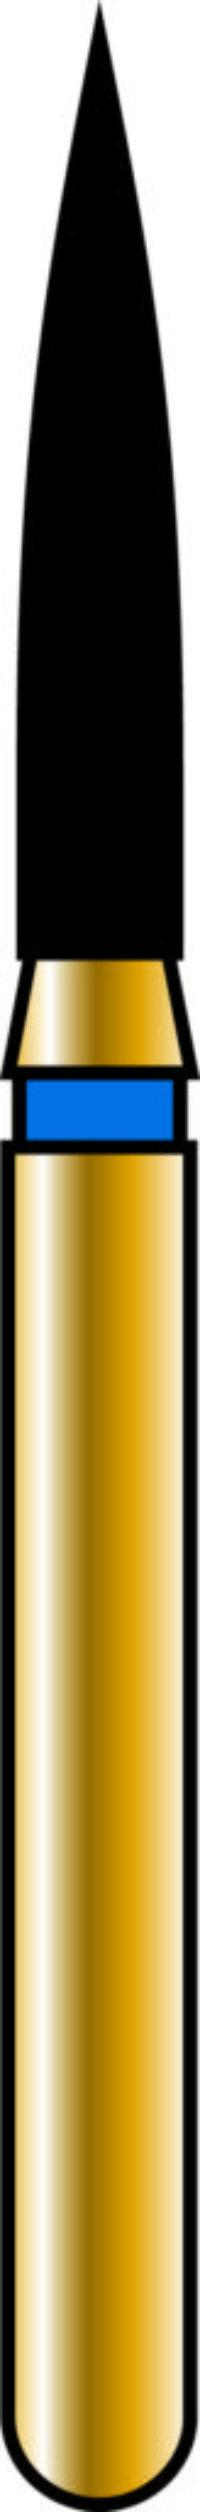 Flame 18-8mm Gold Diamond Bur - Coarse Grit